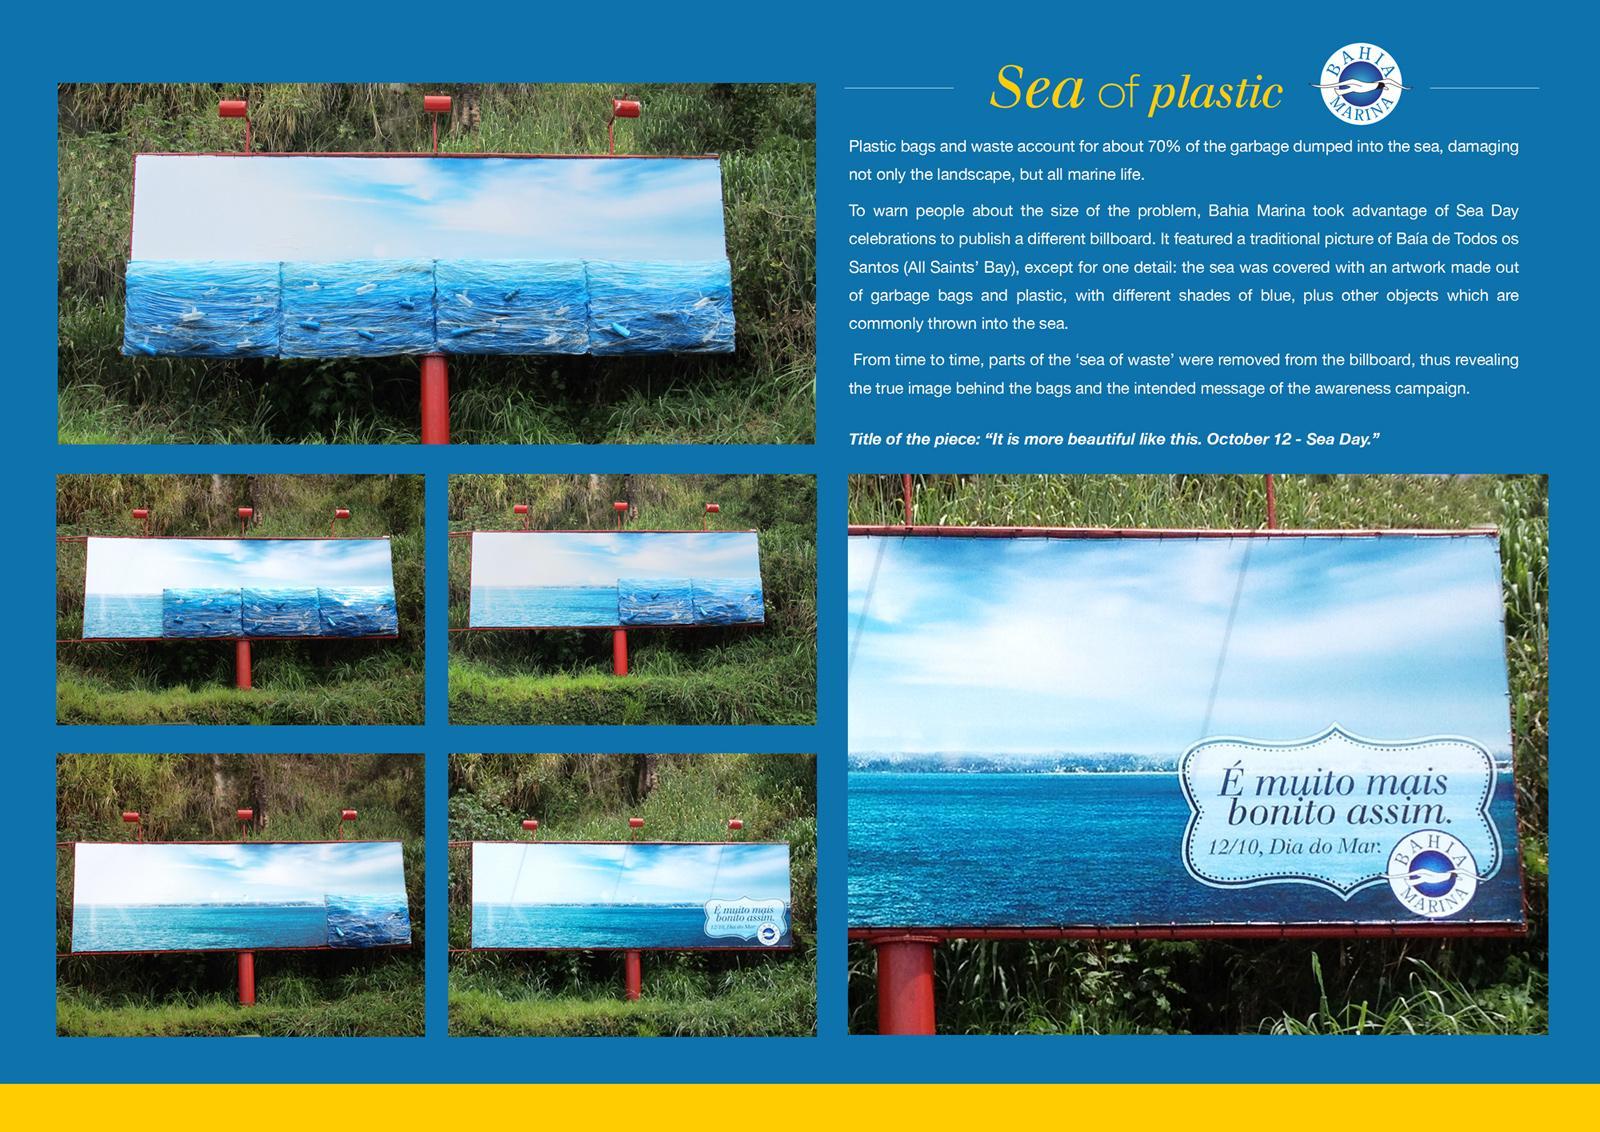 Bahia Marina Outdoor Ad -  Sea of Plastic